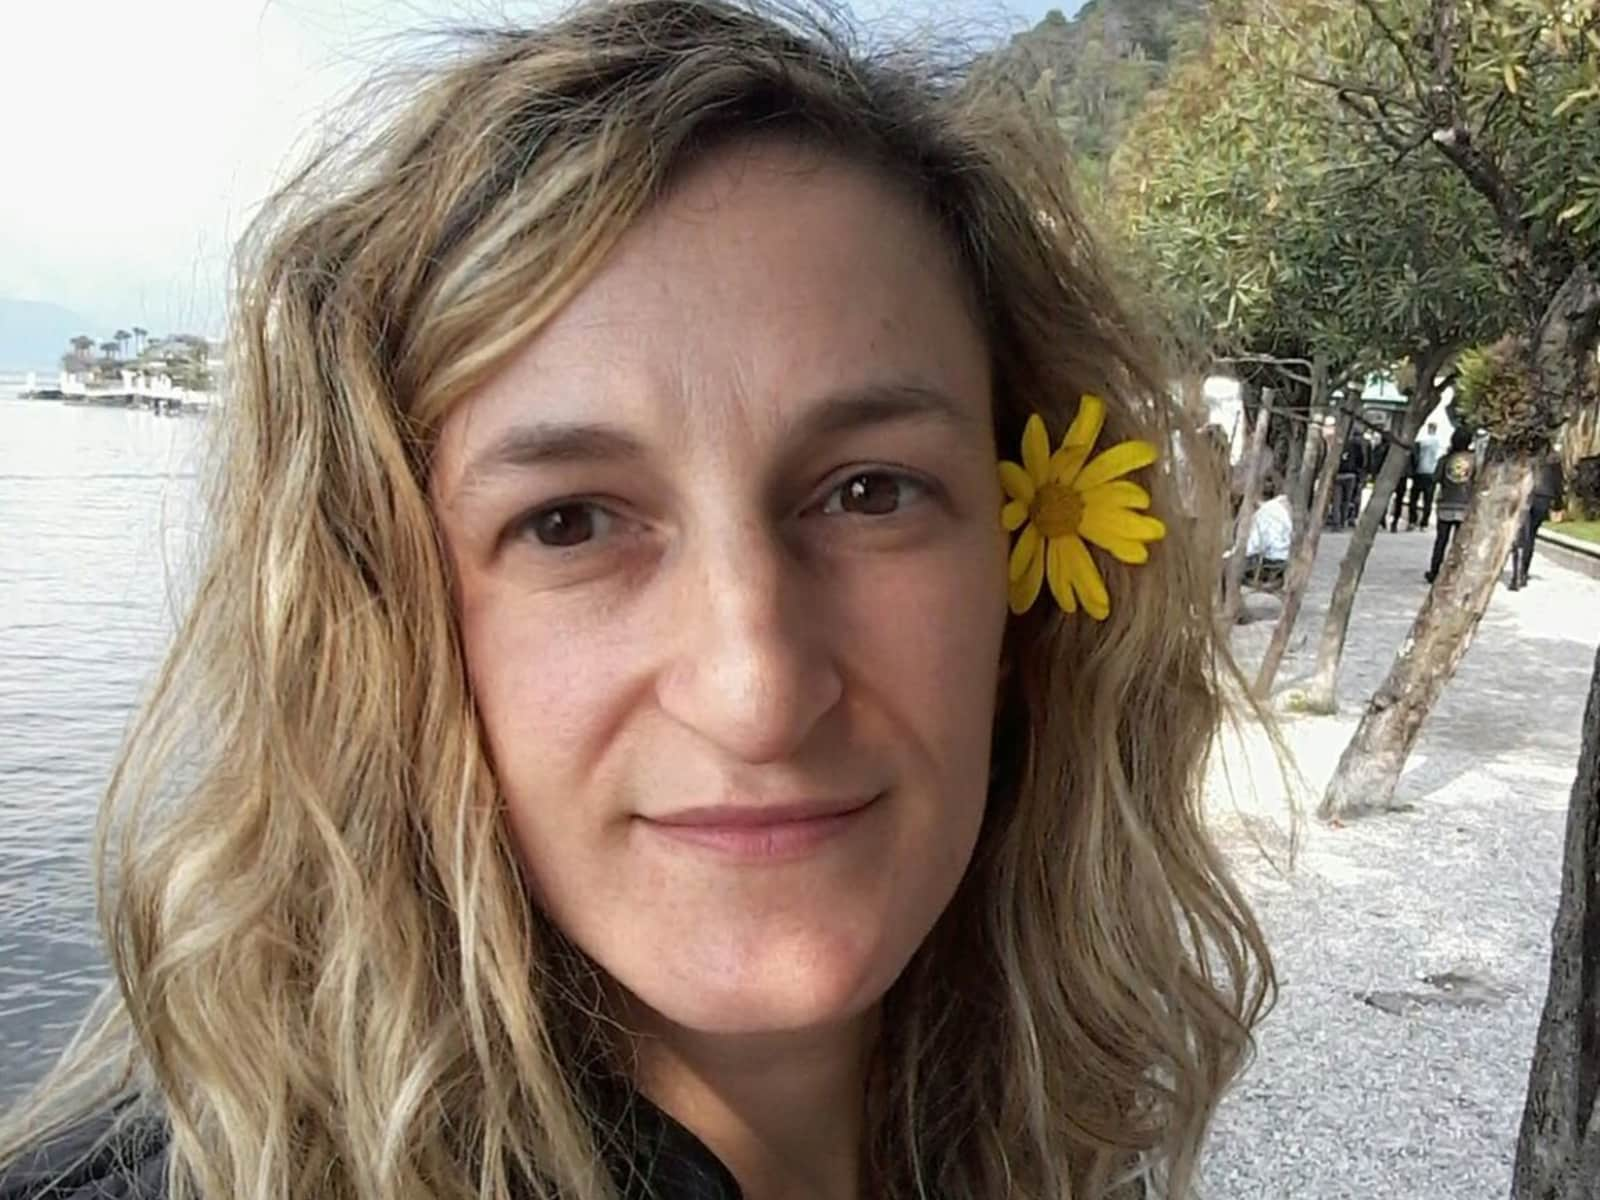 Francesca from Vignola, Italy